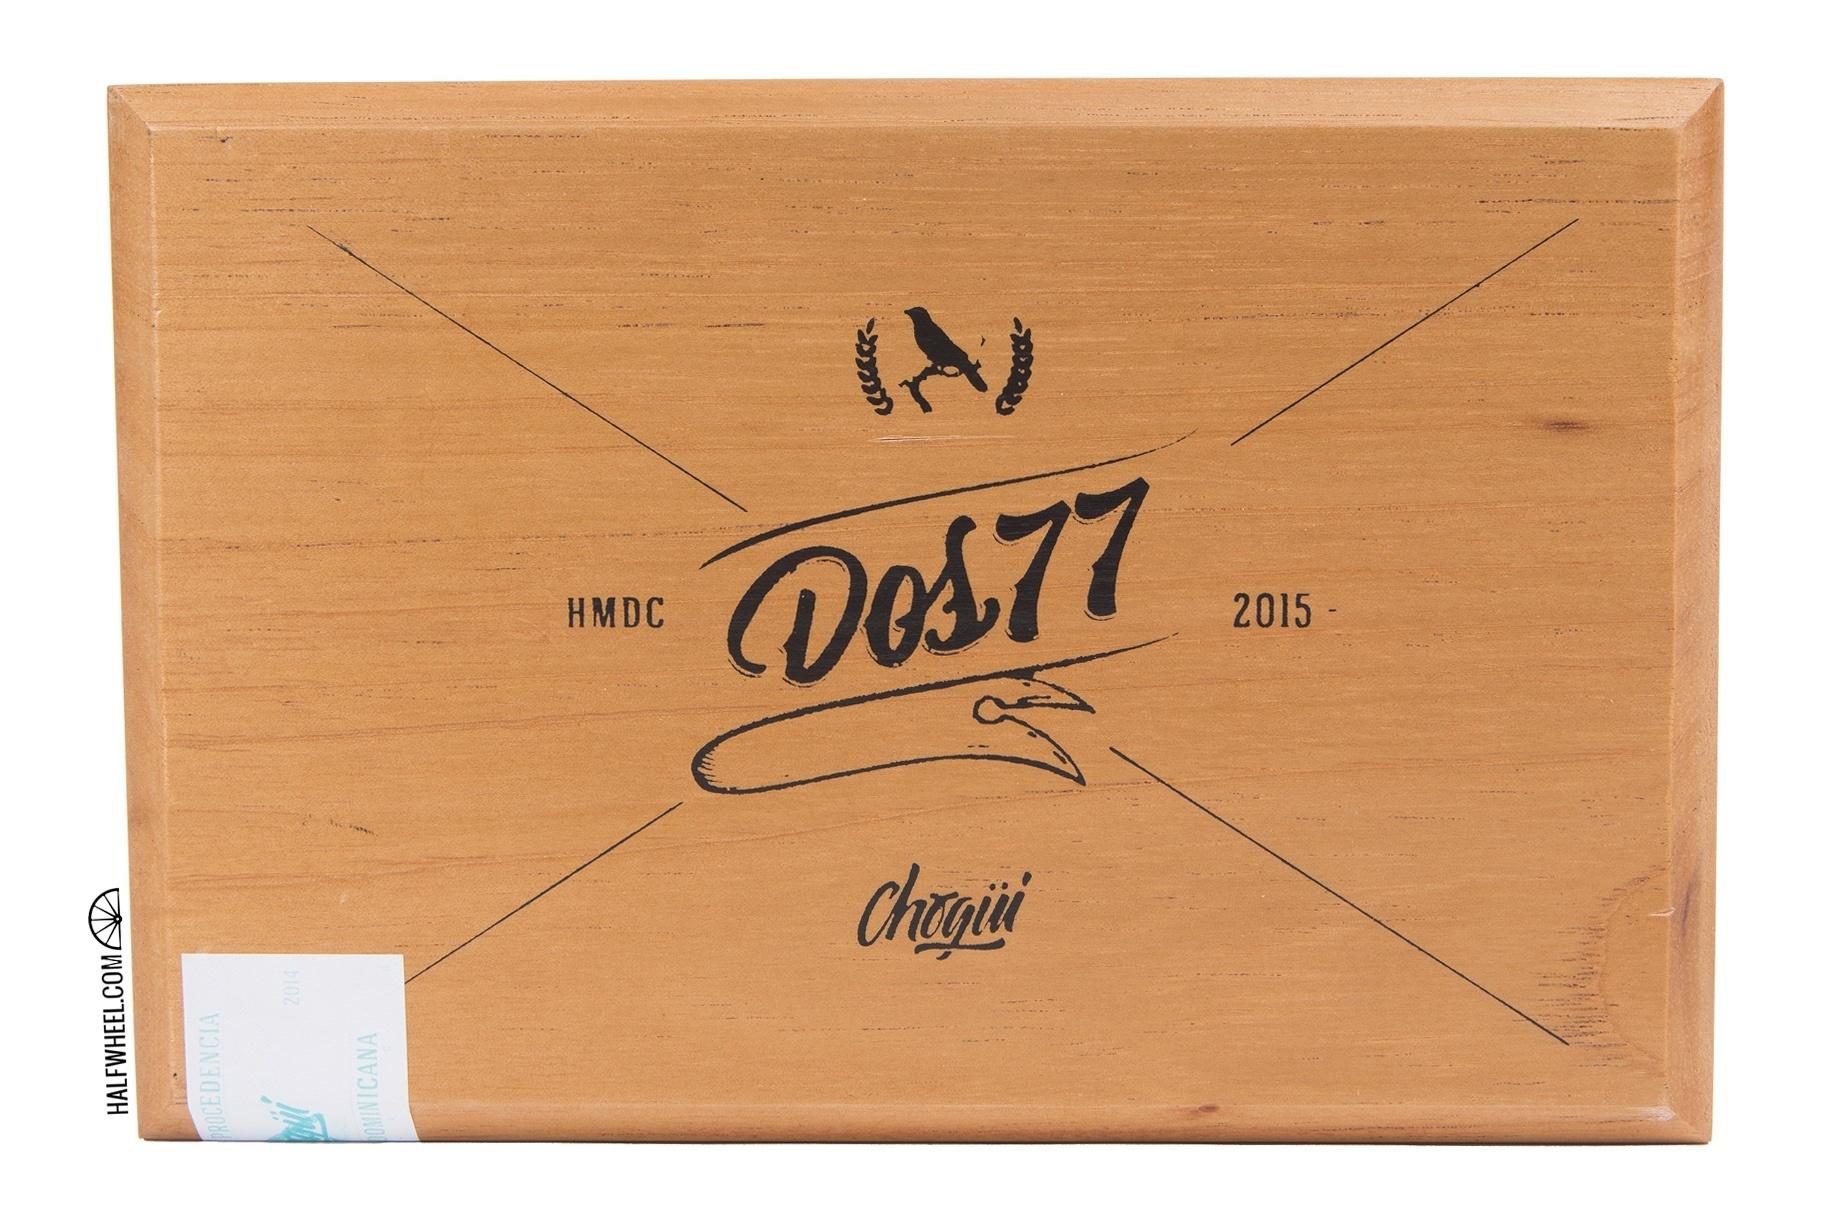 Chogui Dos77 Rogusto Box 1